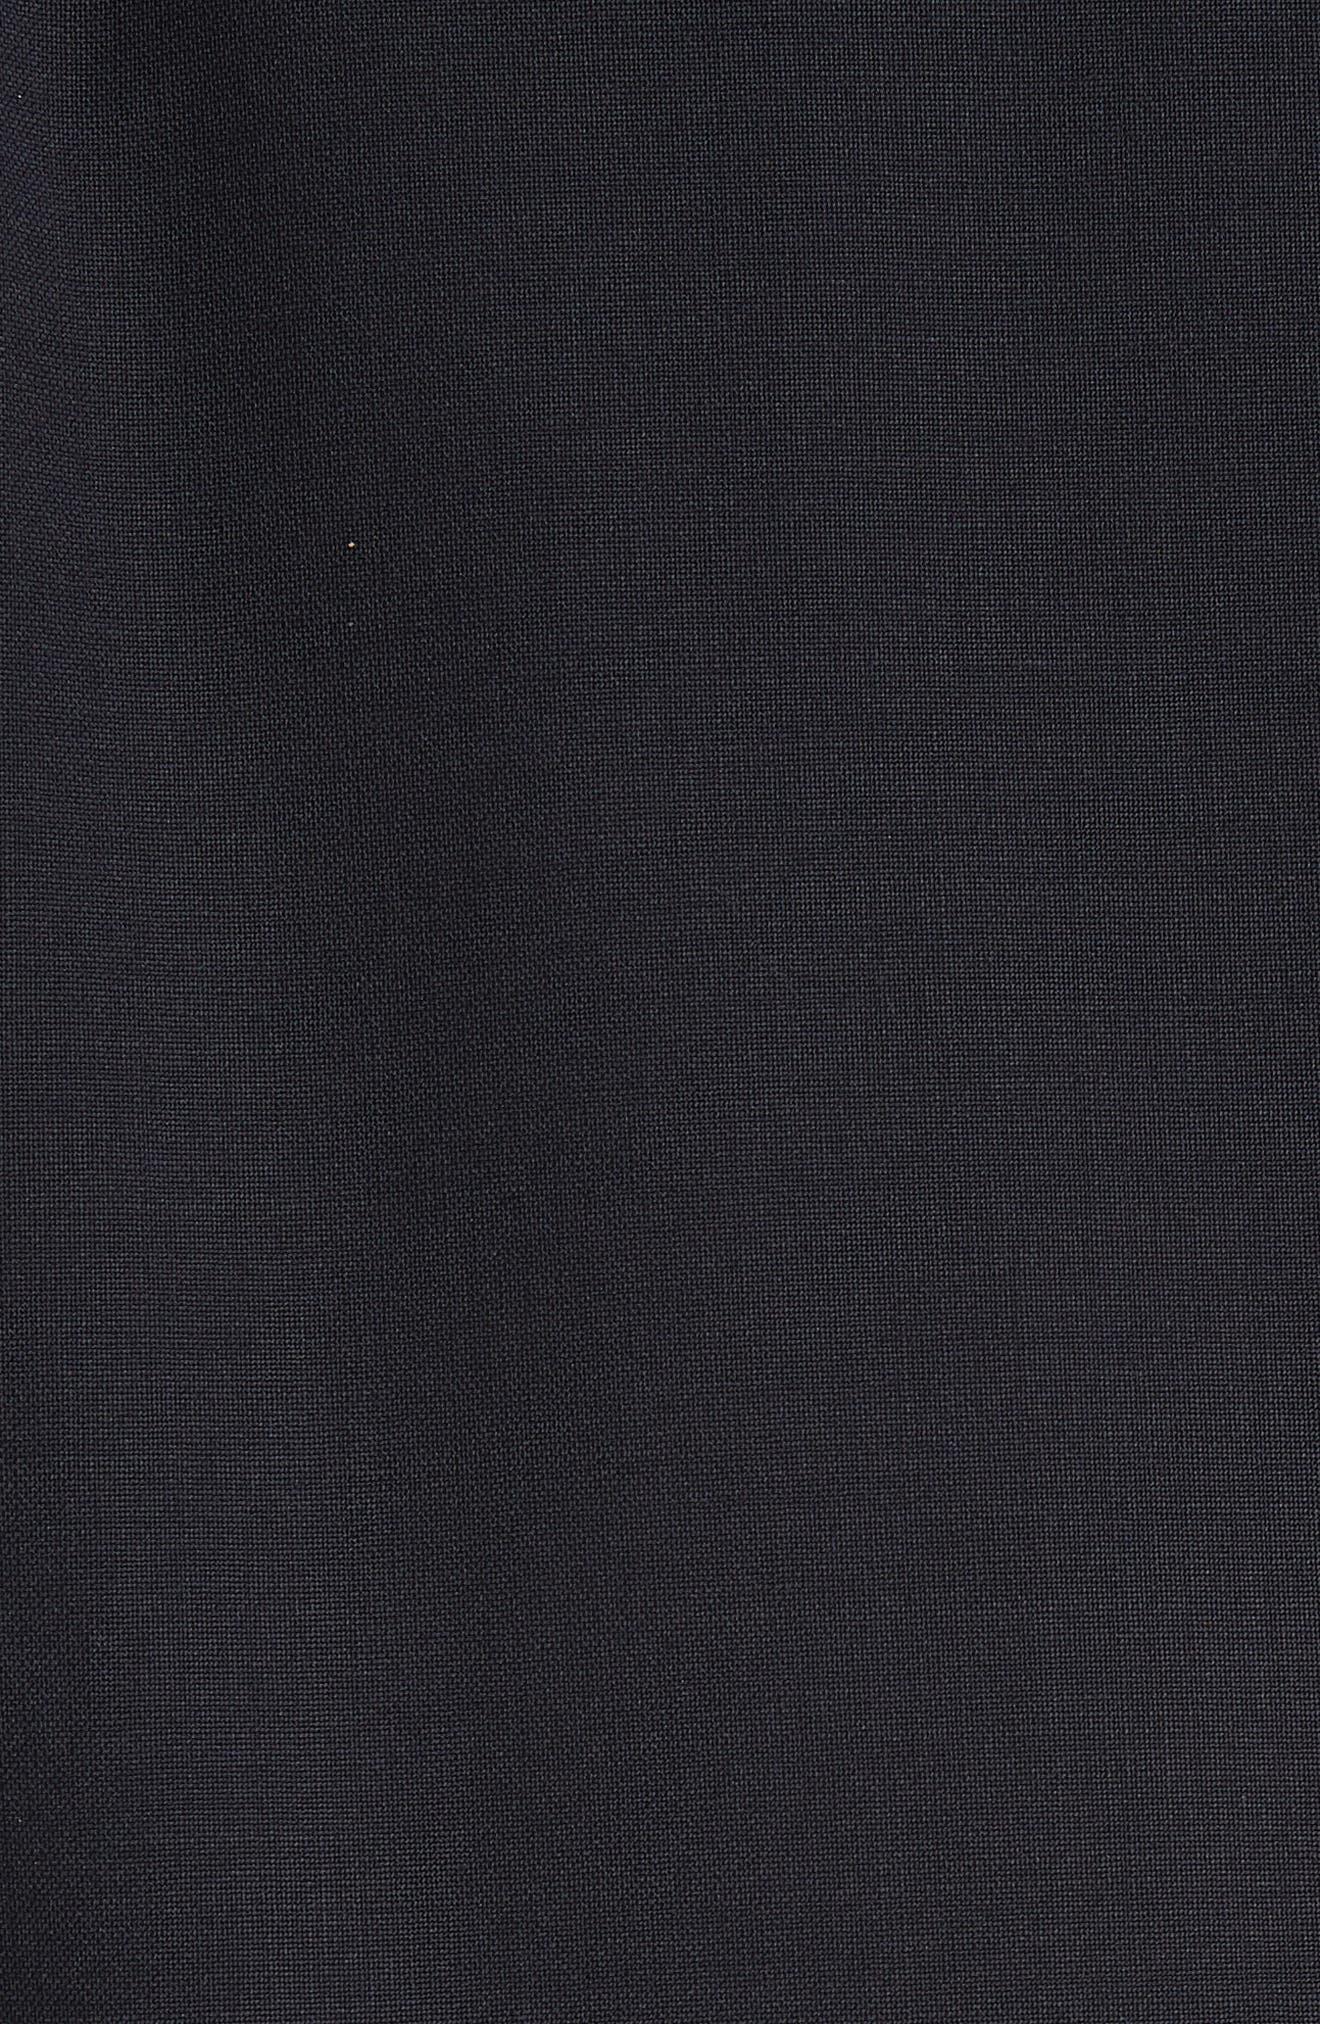 TIBI,                             Plain Weave Blazer Jumpsuit,                             Alternate thumbnail 6, color,                             DARK NAVY